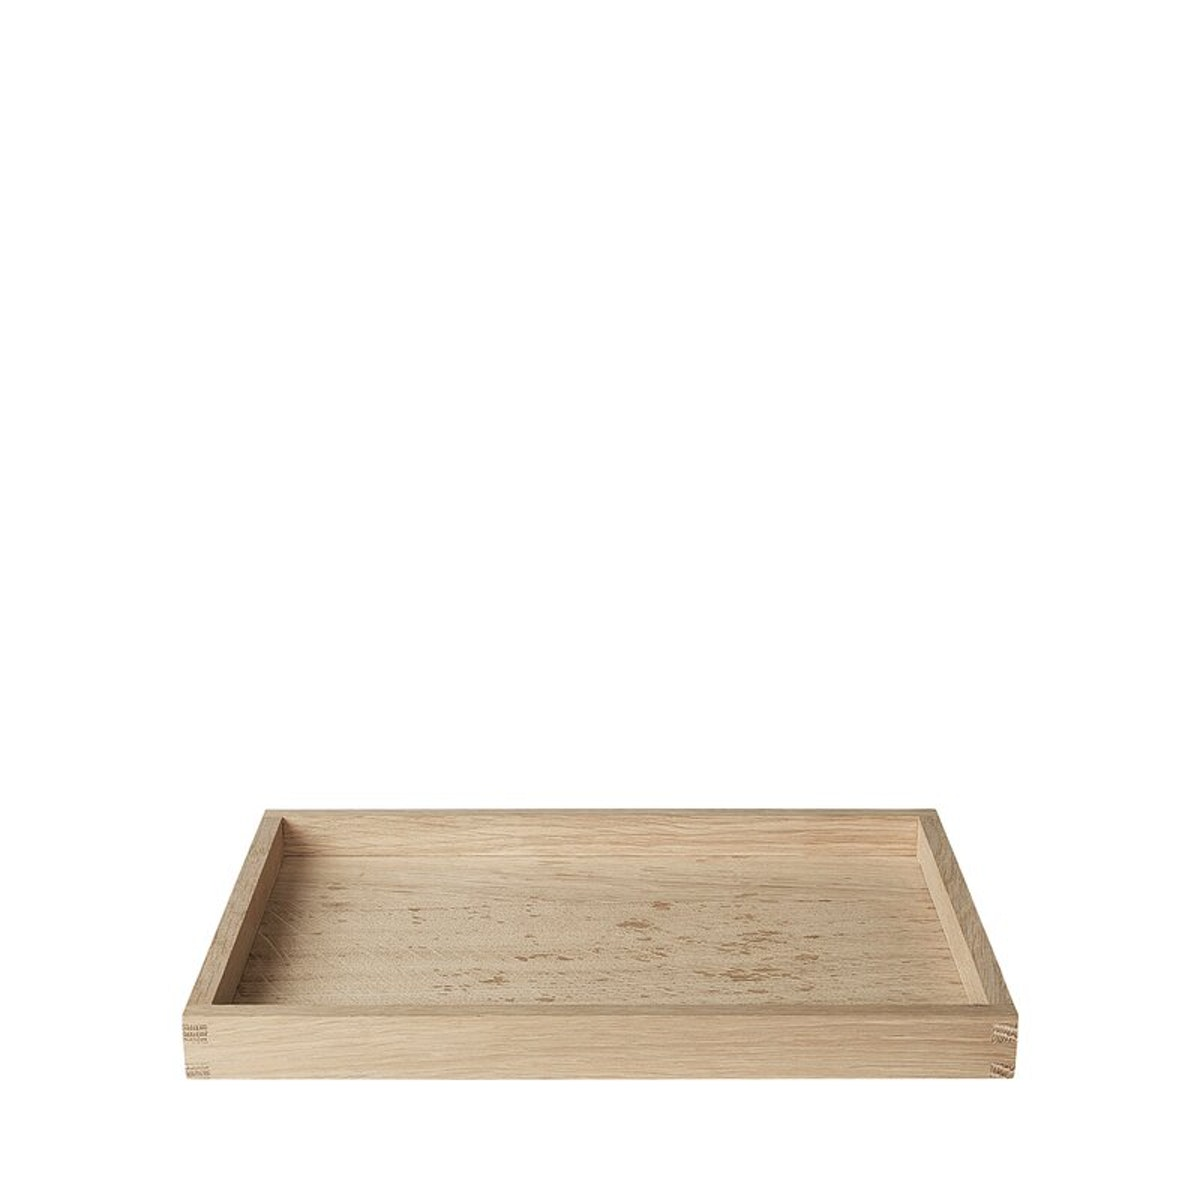 Borda Coffee Table Tray